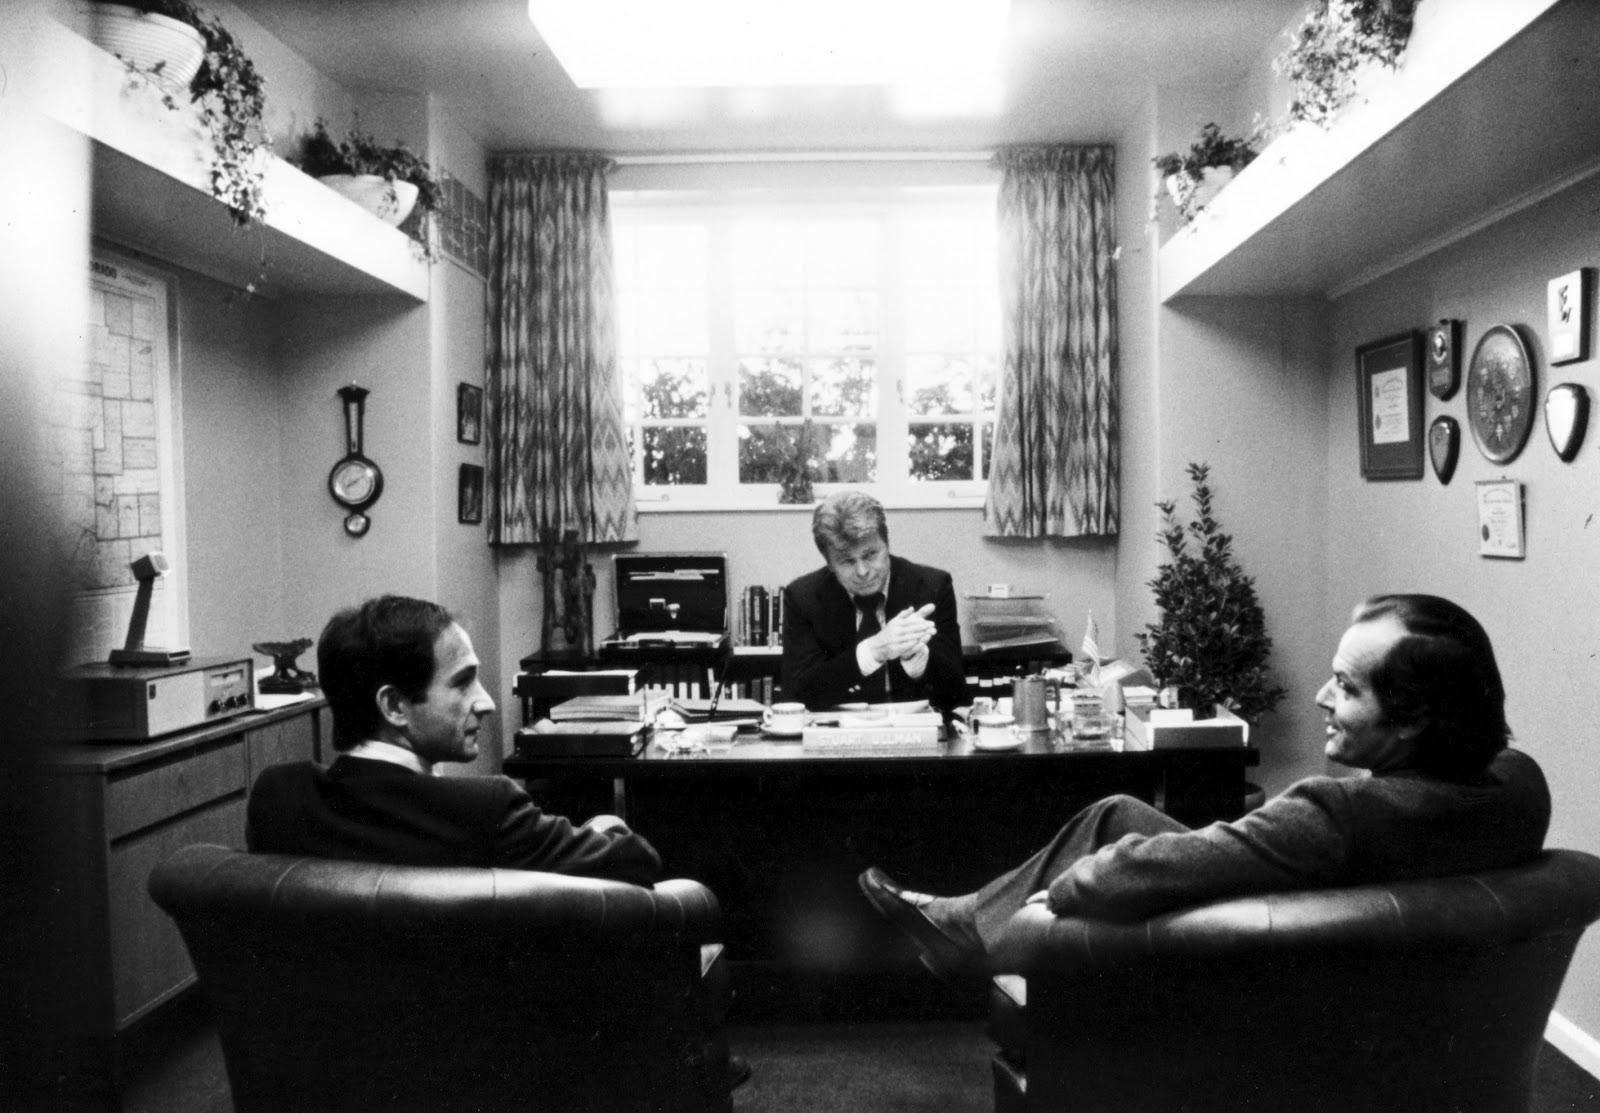 The Korova Milk Bar: Film stills from the shining 1980